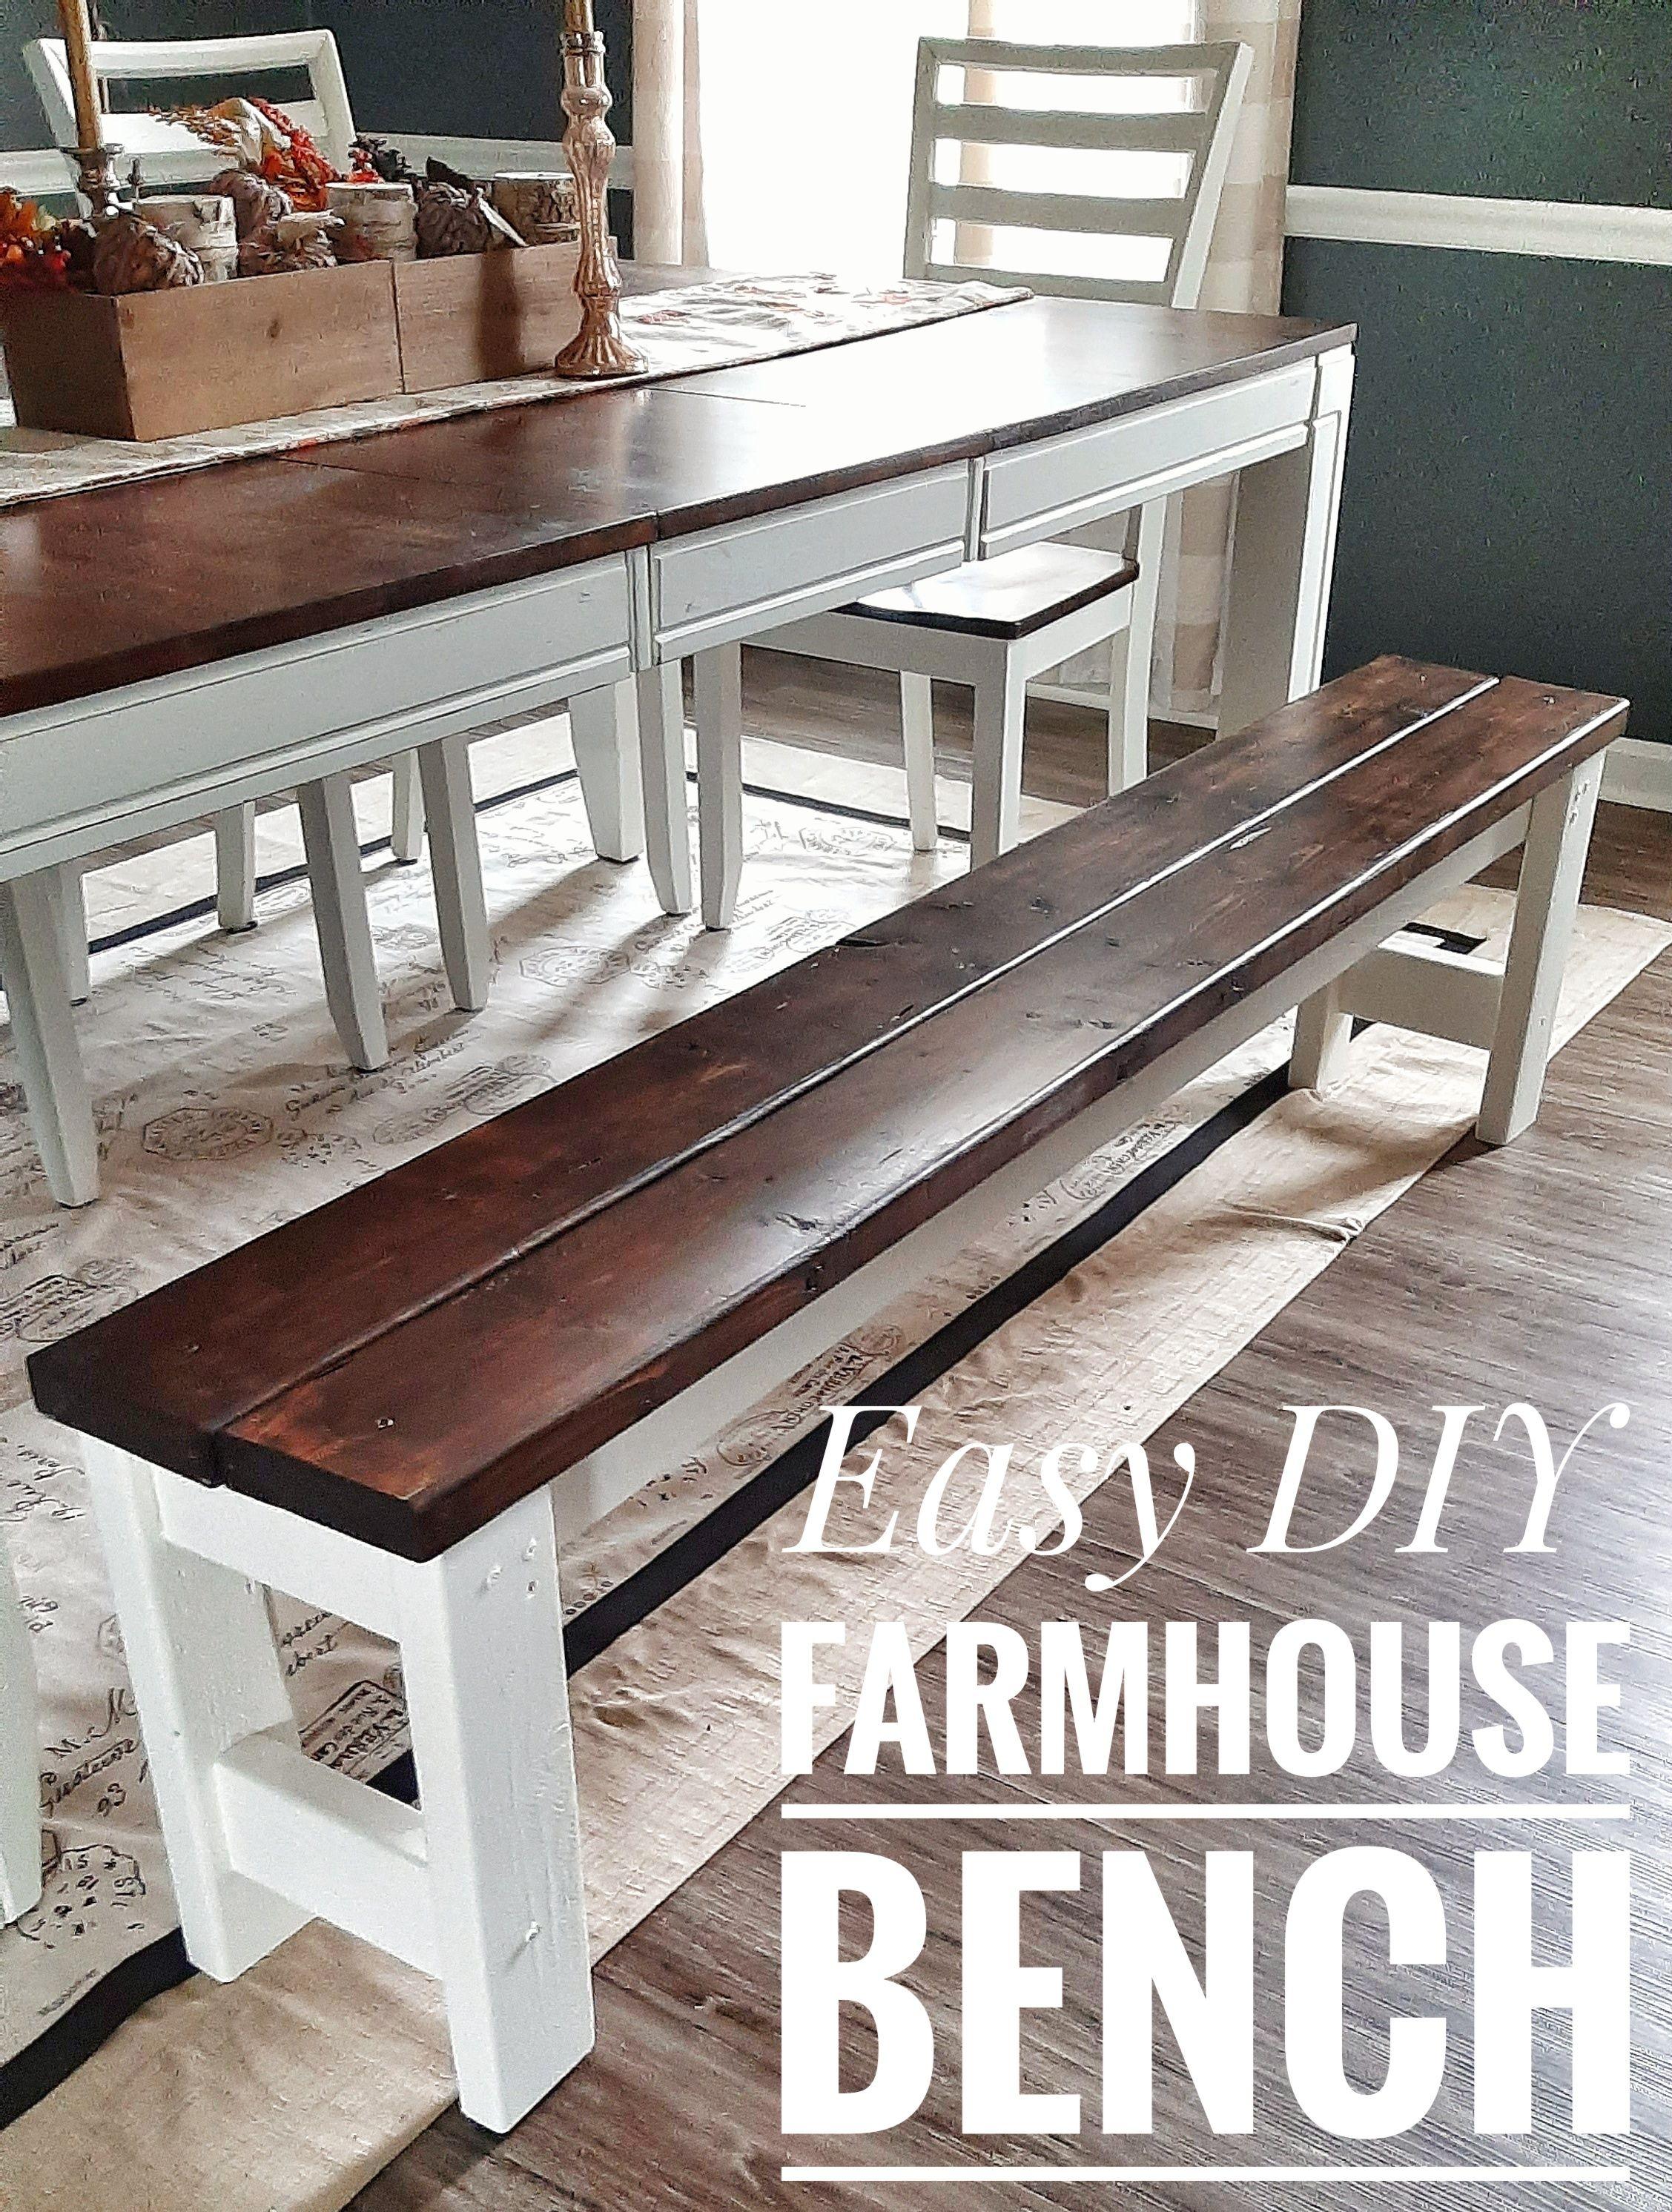 Easy Diy Farmhouse Bench Farmhouse Bench Diy Diy Dining Room Dining Table With Bench